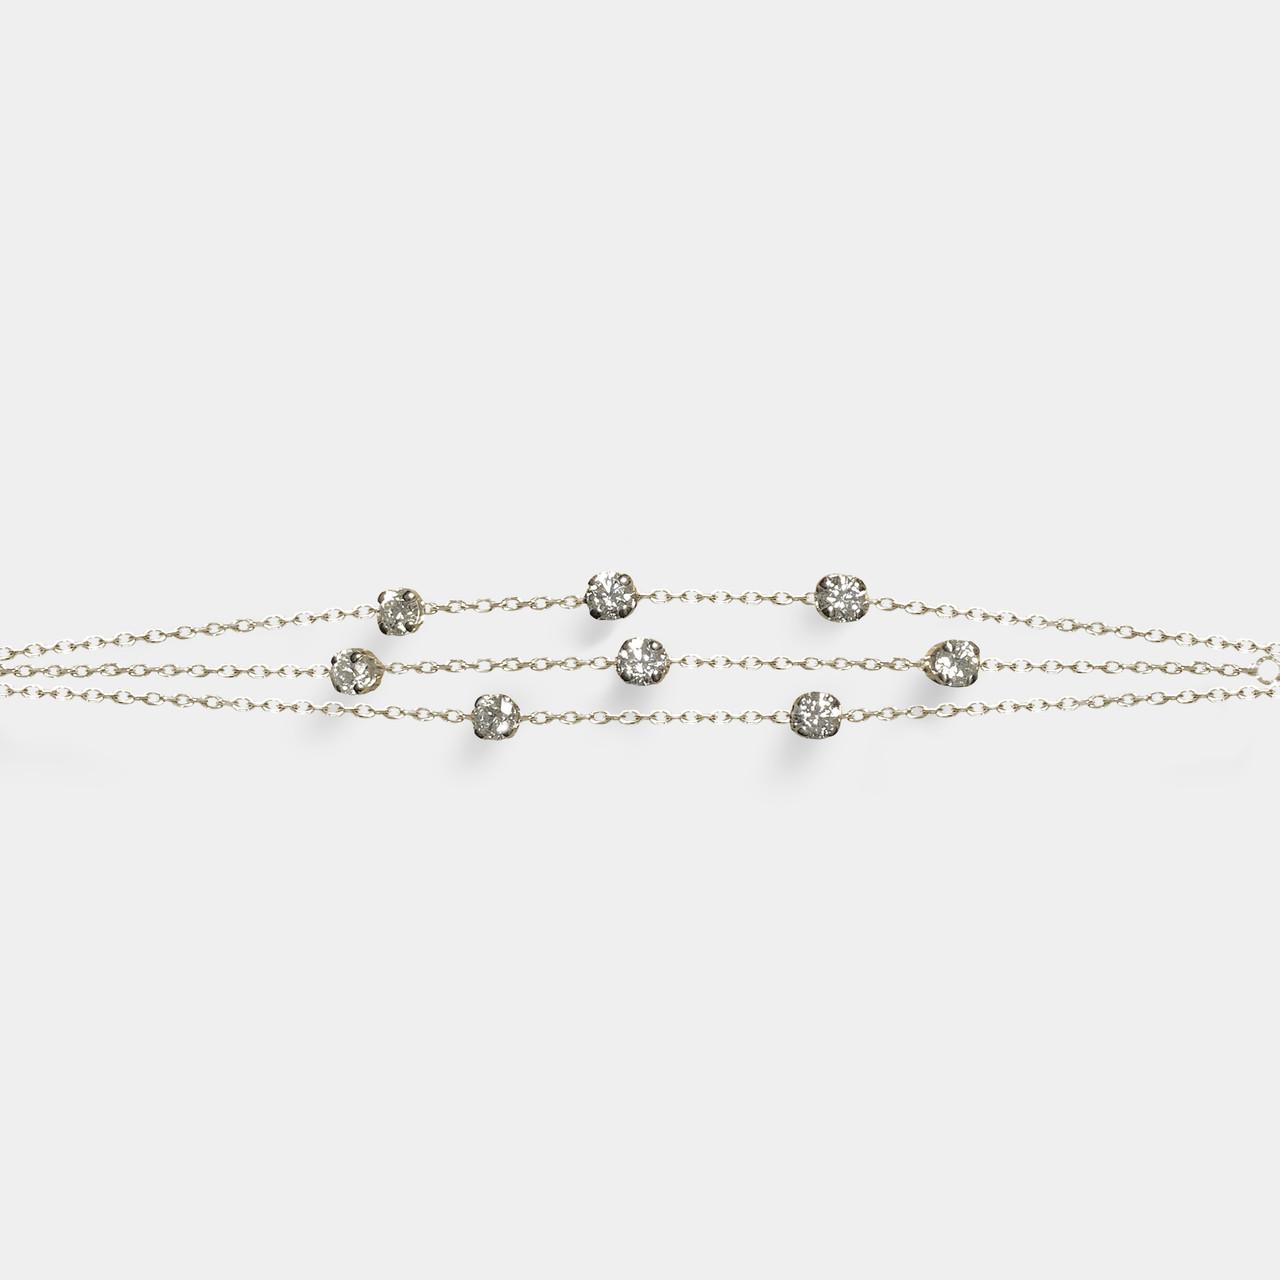 Bracelet 3 Rangs Diamants, Bracelet Or Femme Diamants